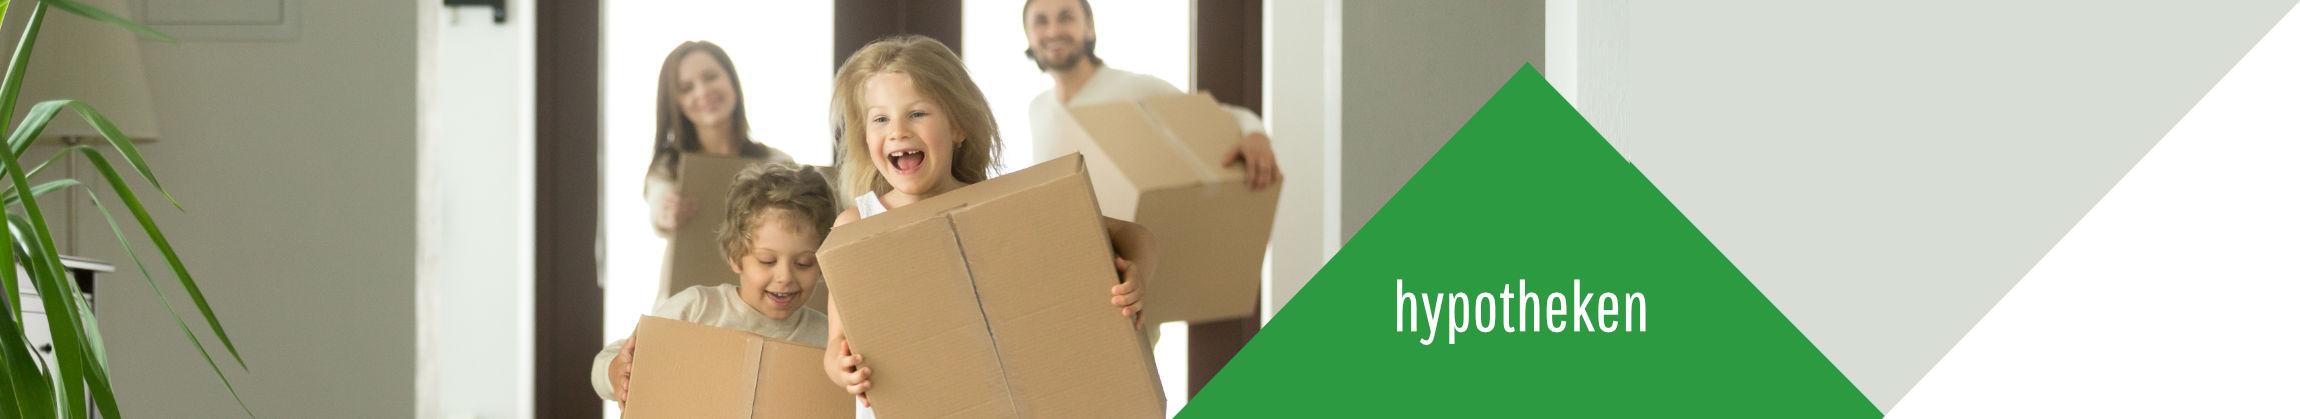 header-hypotheken